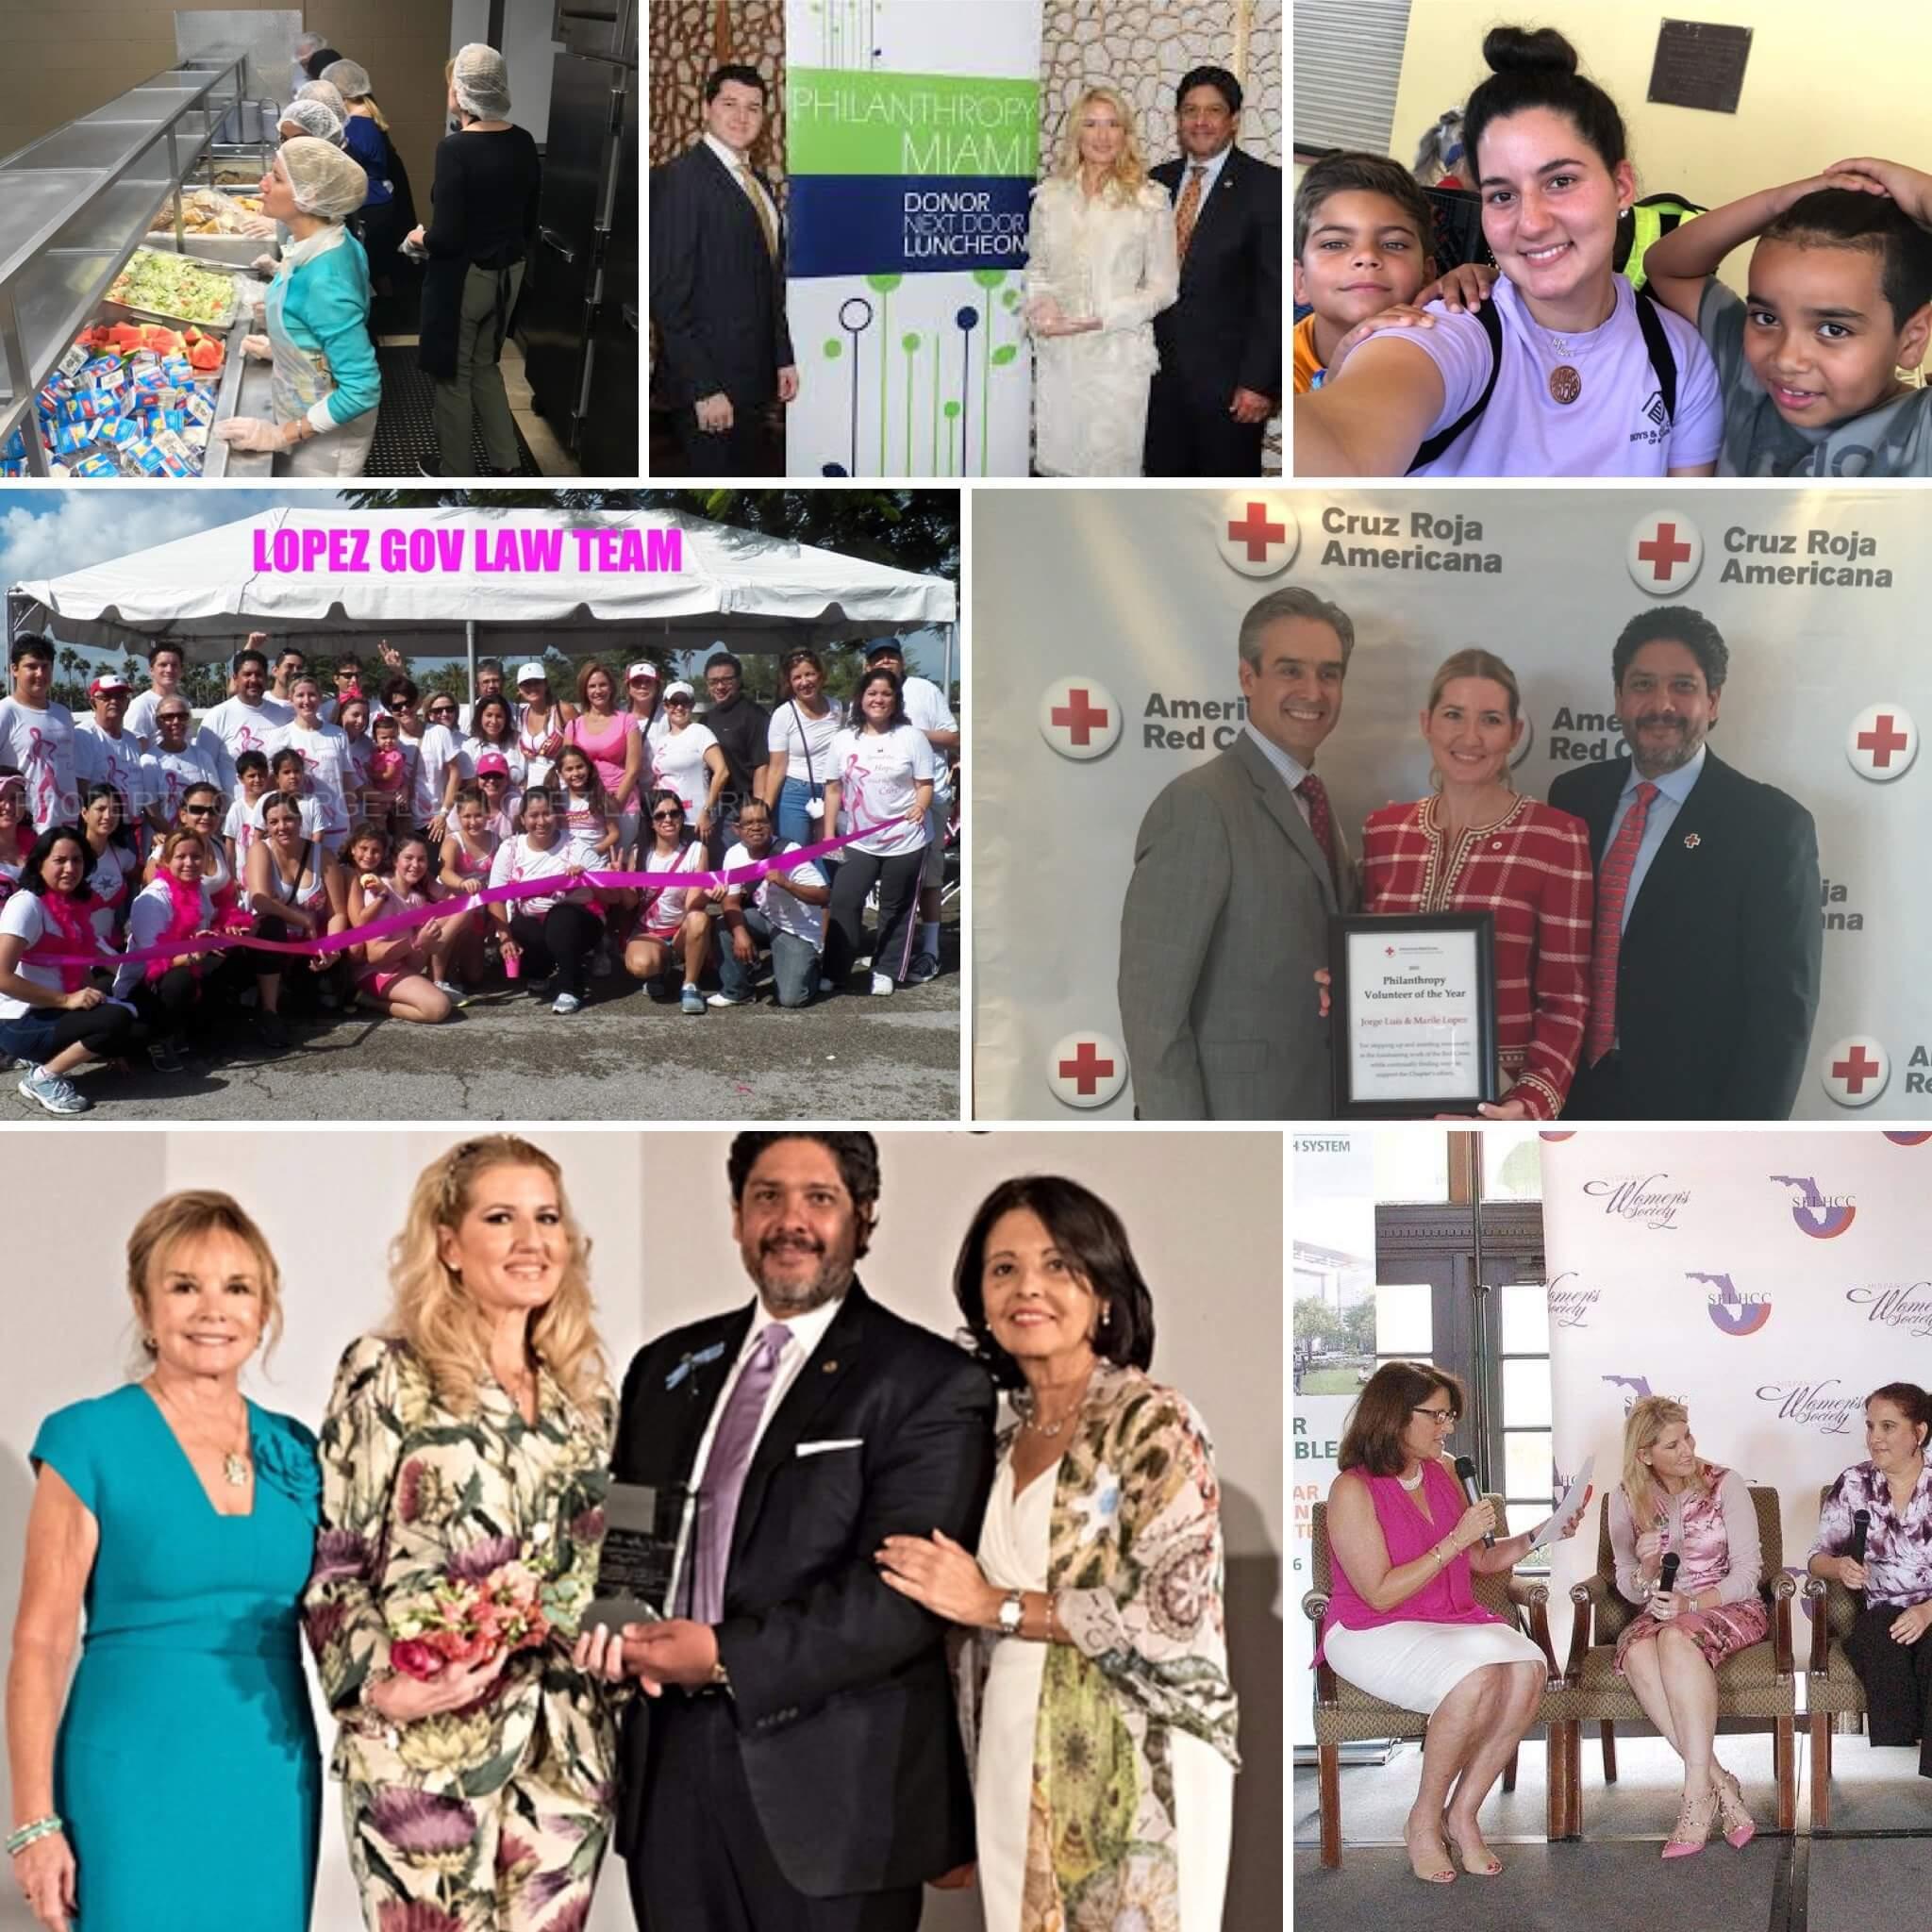 Marile & Jorge Luis Lopez, Esq. philanthropy